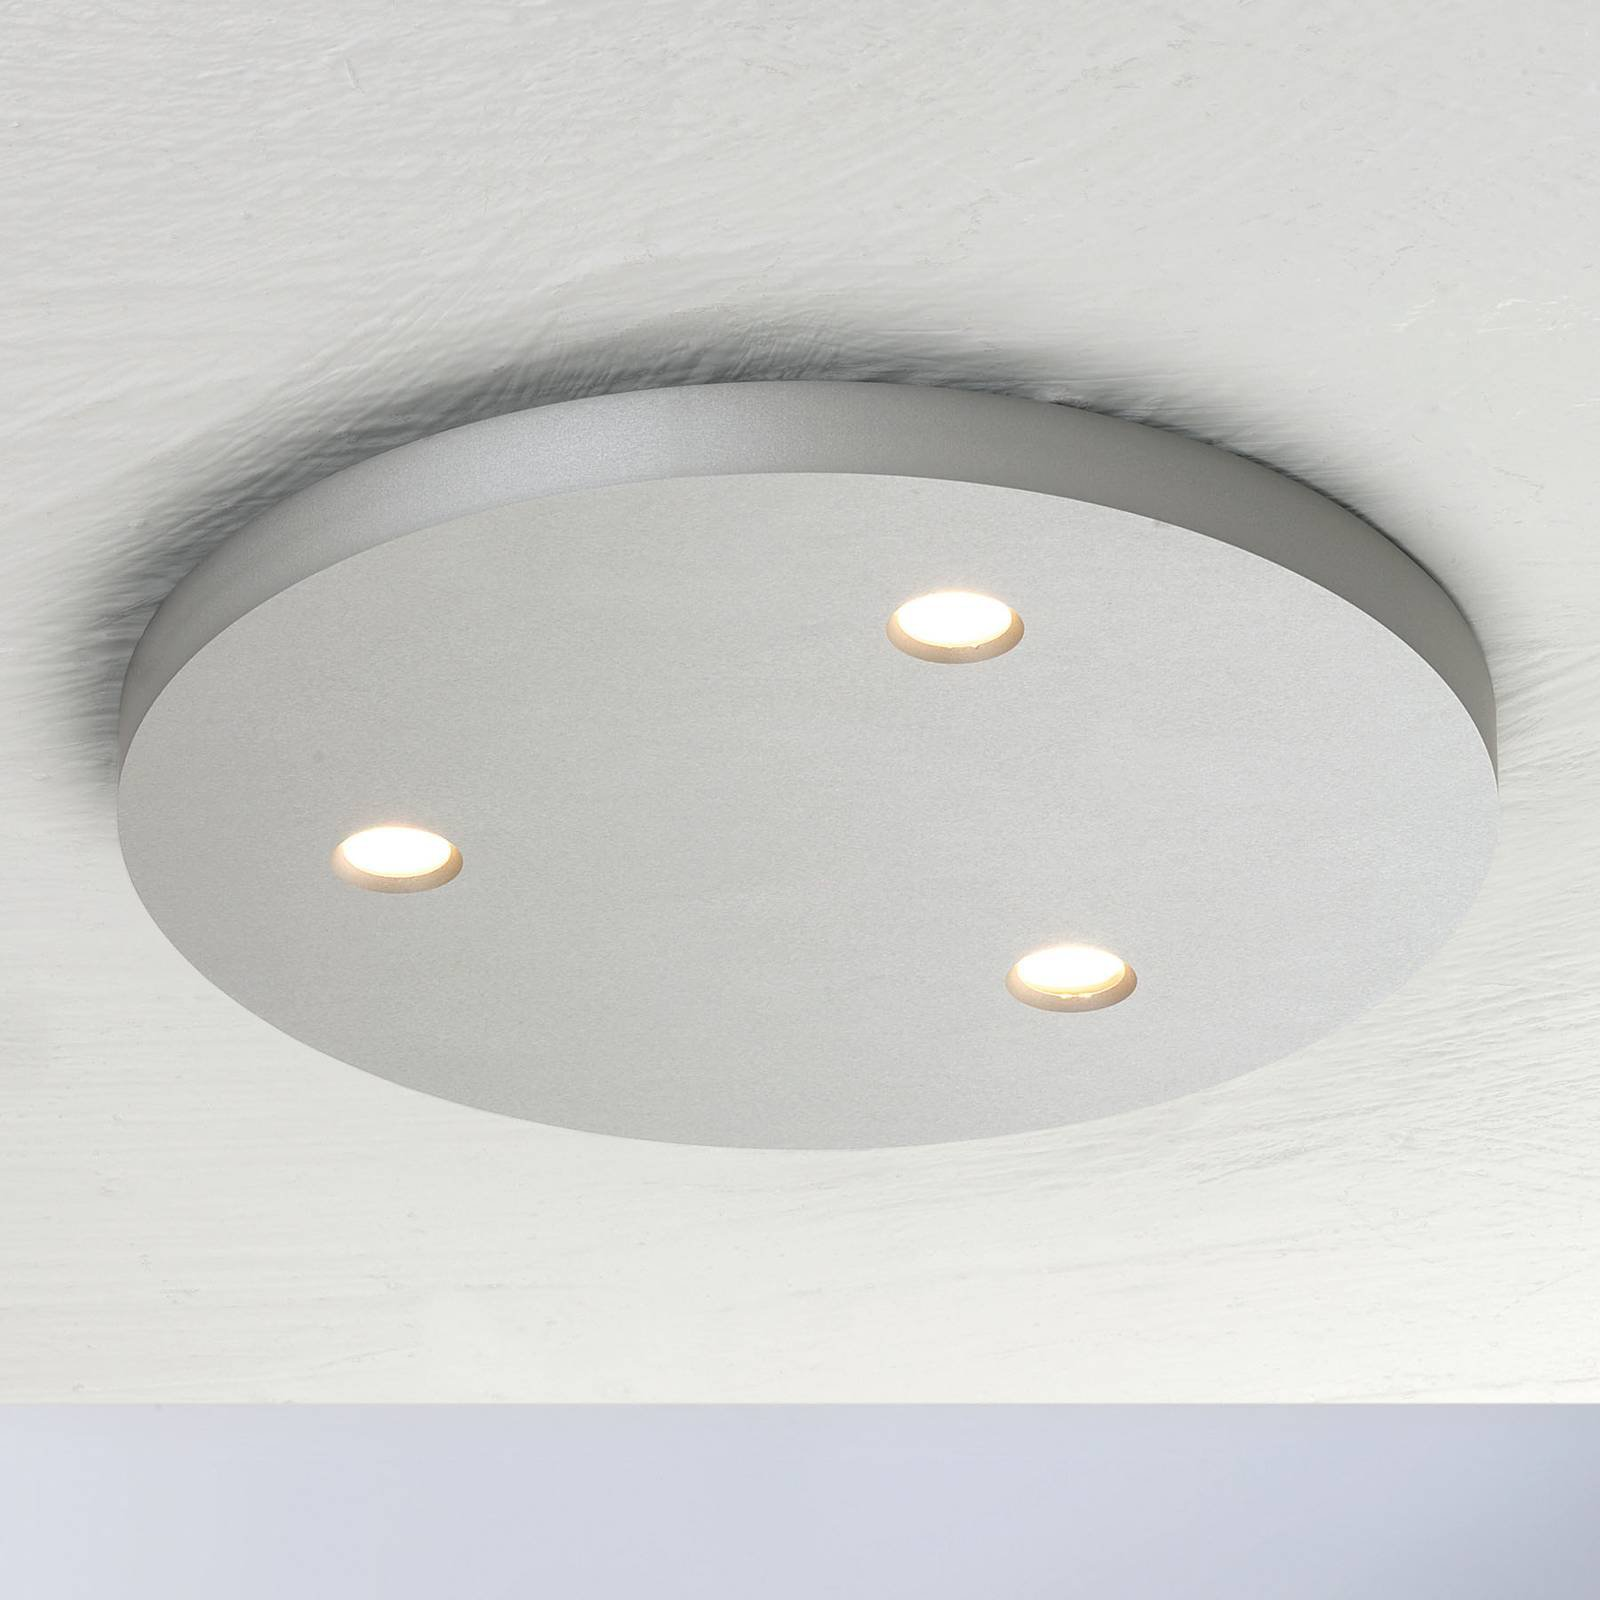 Bopp Close LED-taklampe, tre lyskilder, rund, alu